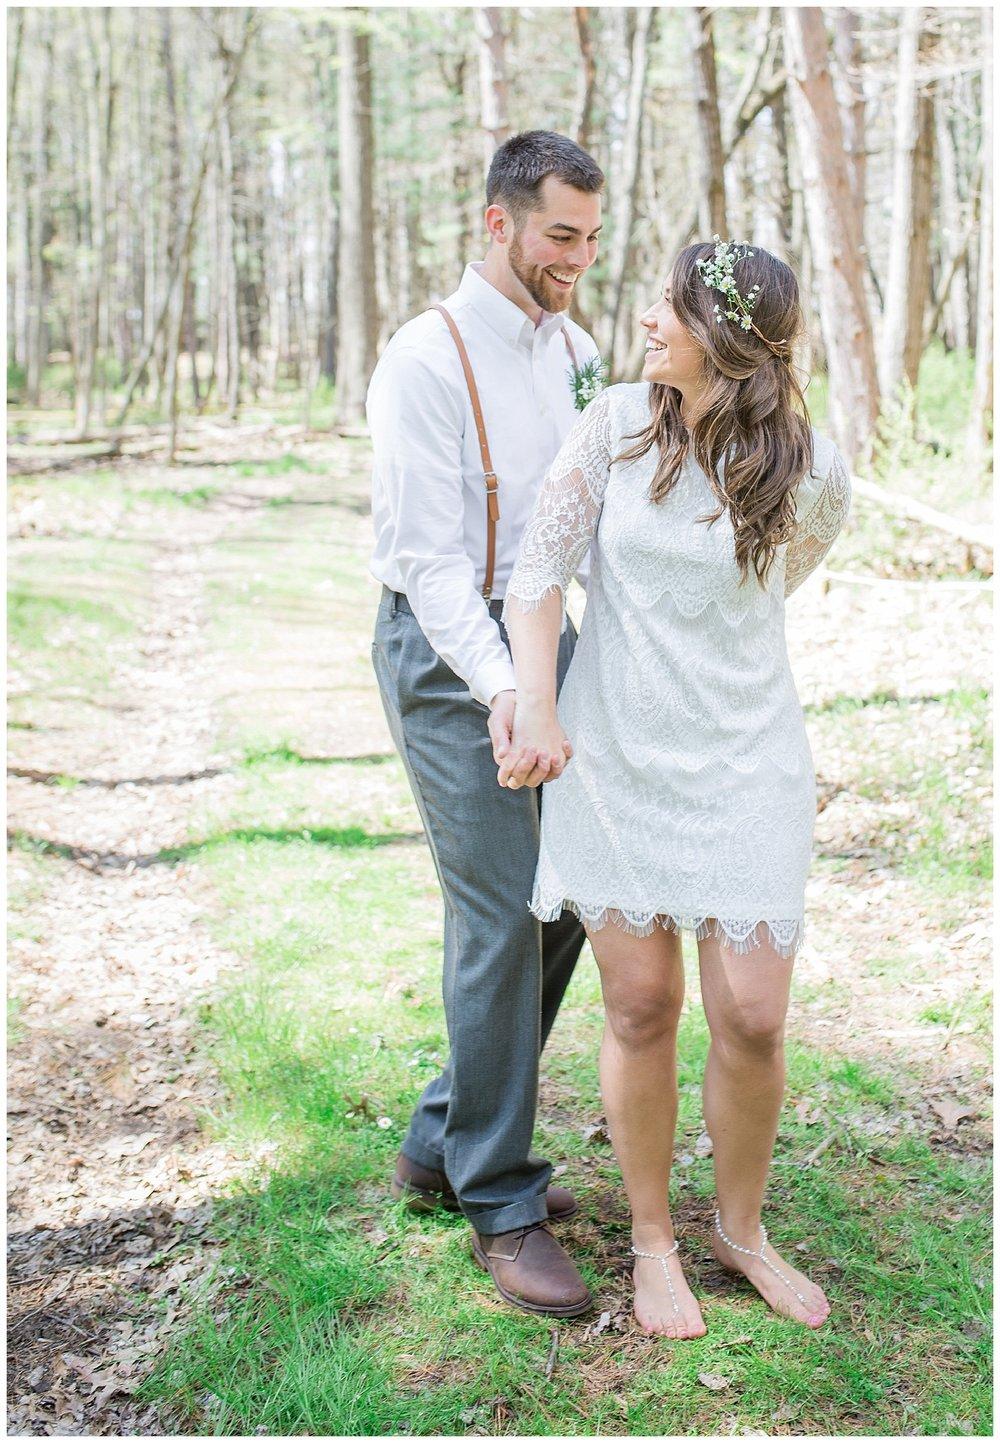 Letchworth state park wedding - whimsical boho romance - rochester 31.jpg